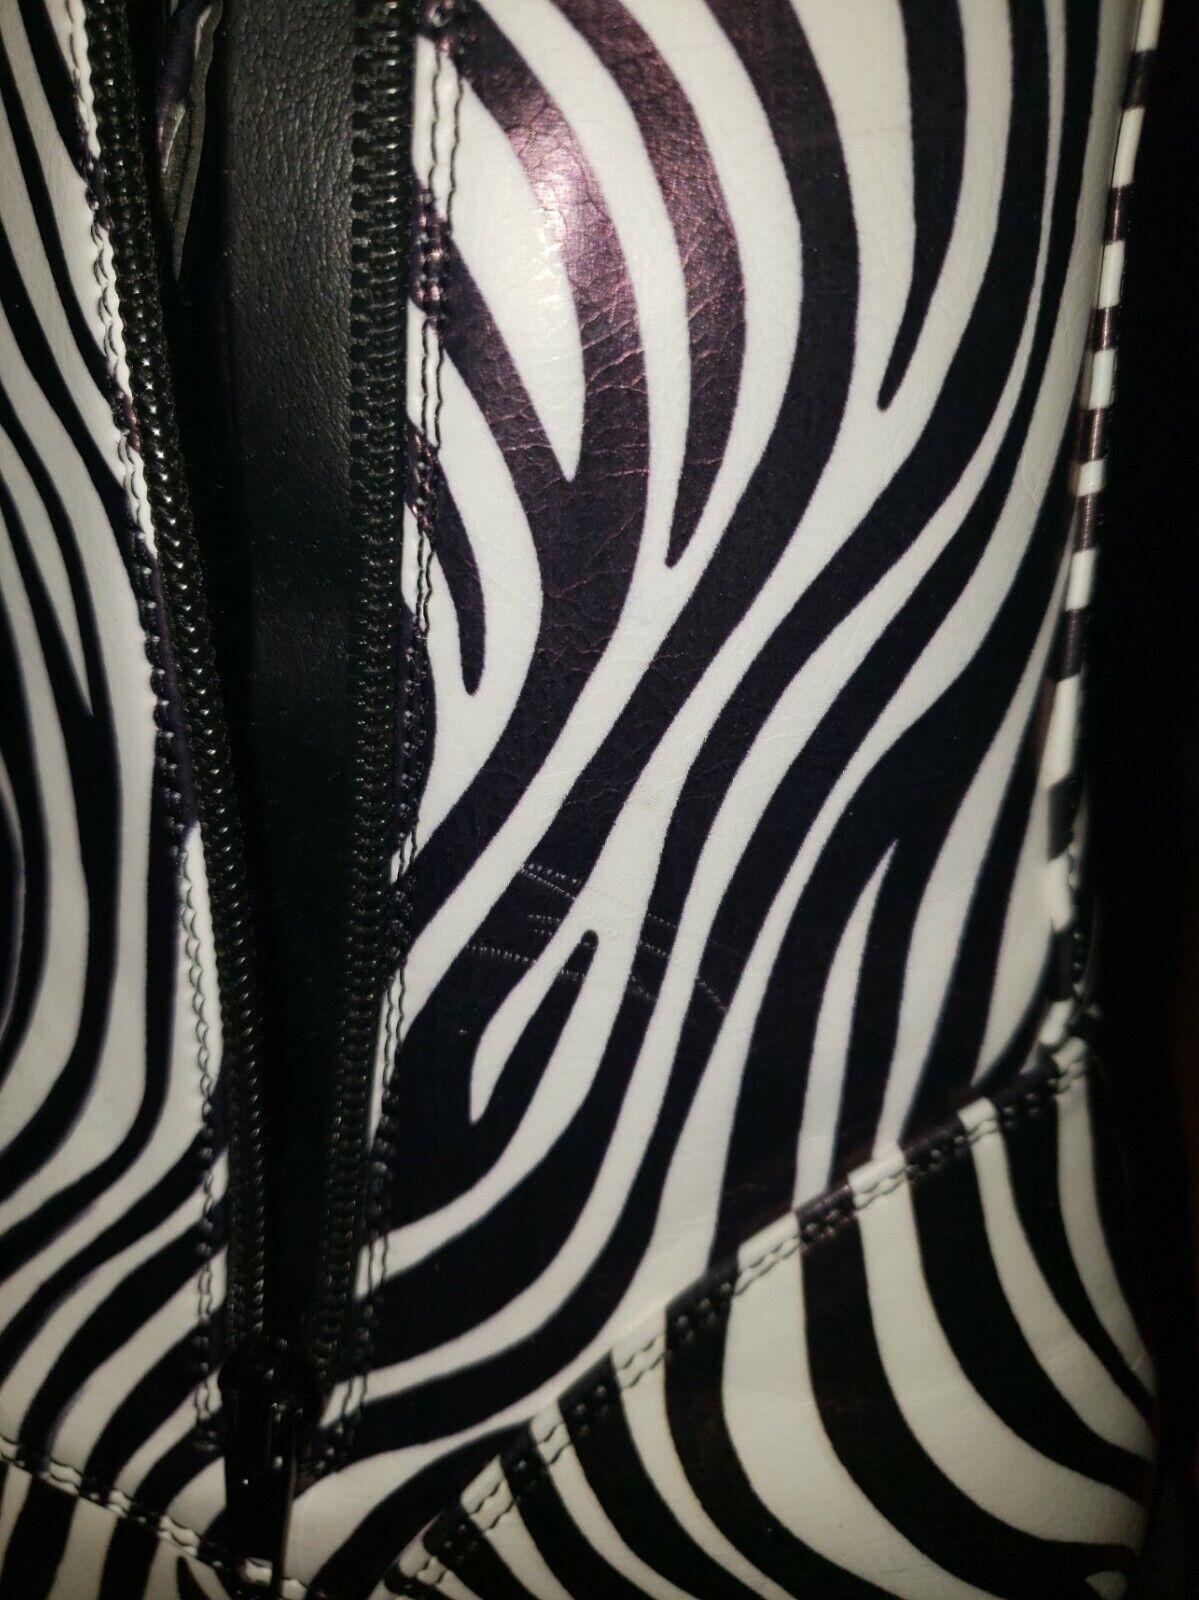 cinak mid calf zebra print womens size 7 boots - image 9